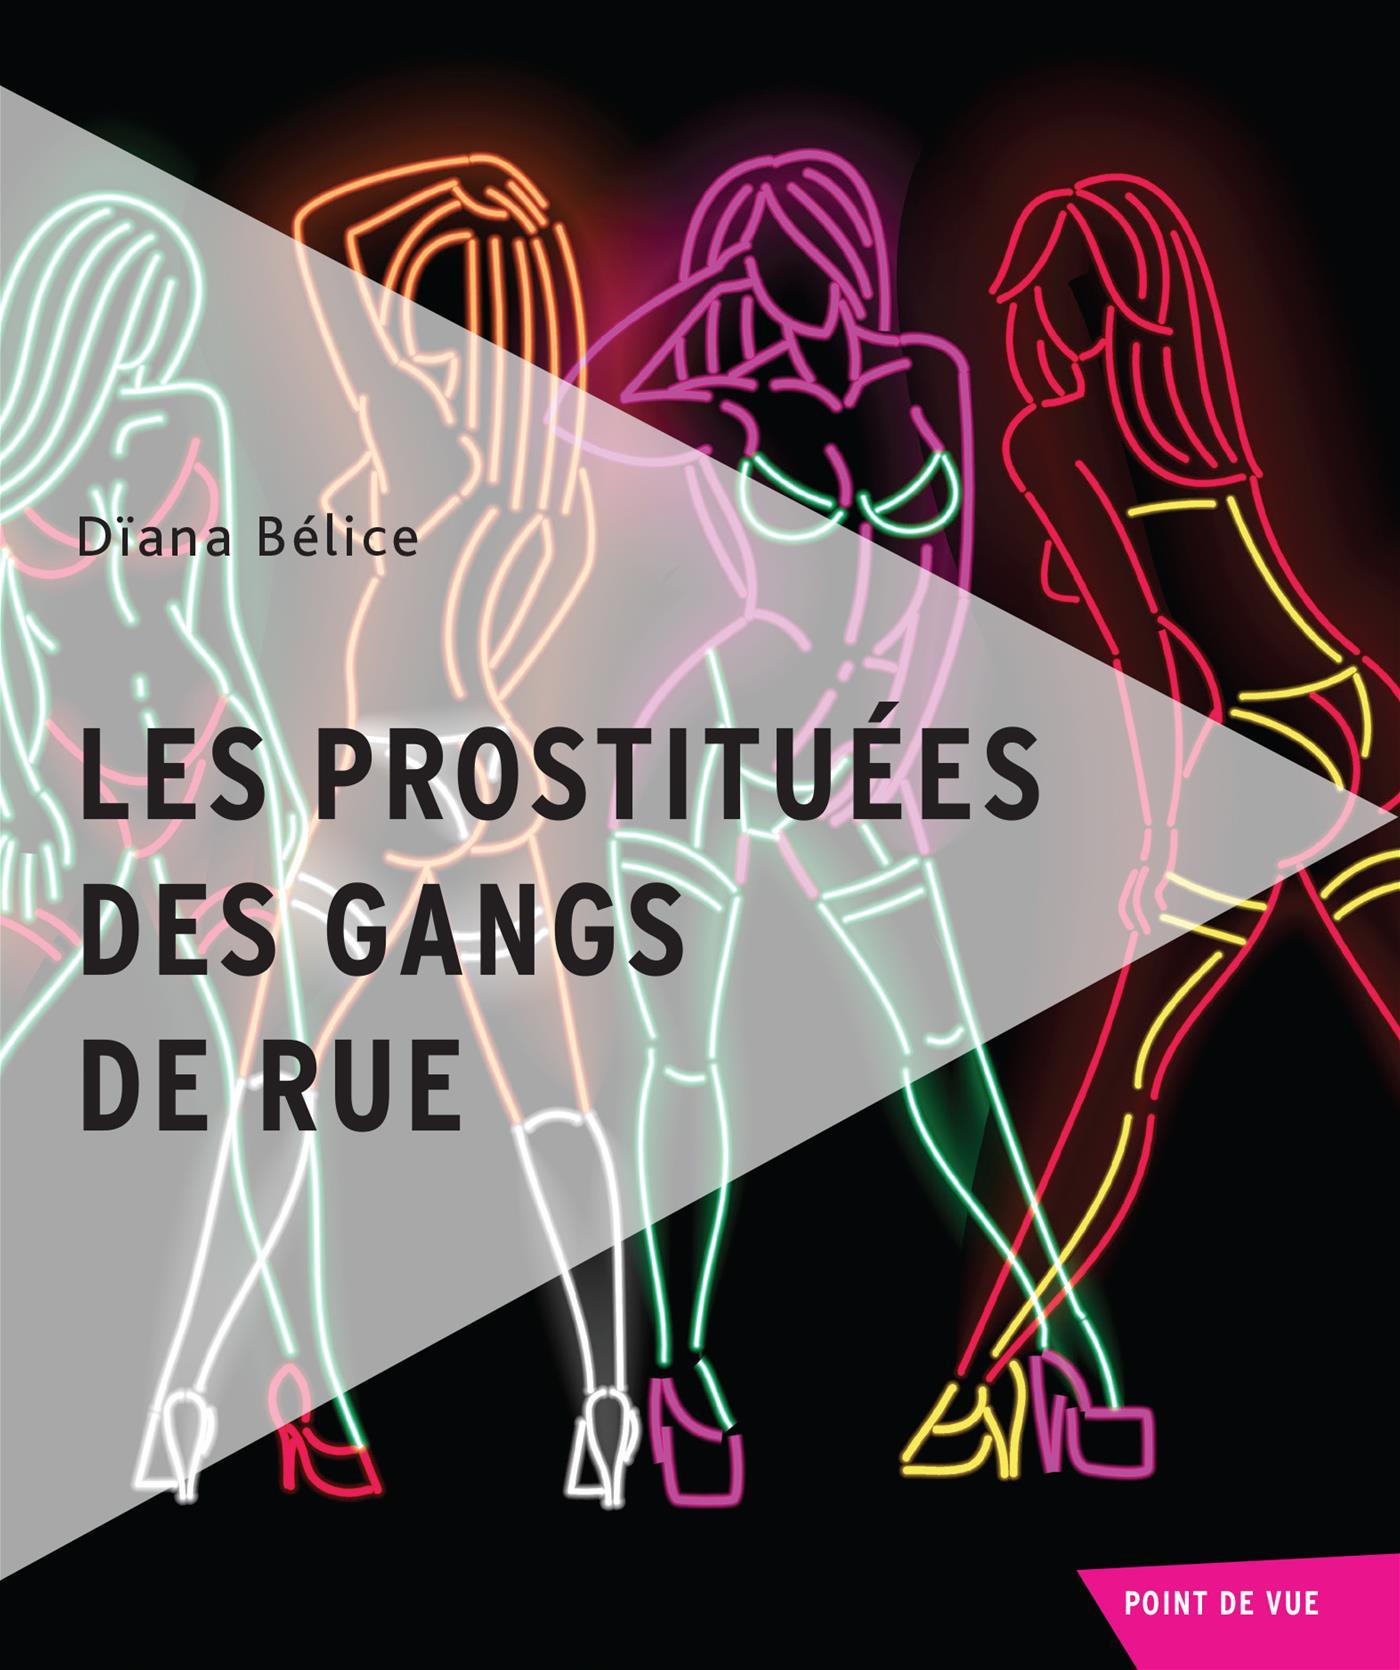 Les prostituees montpellier